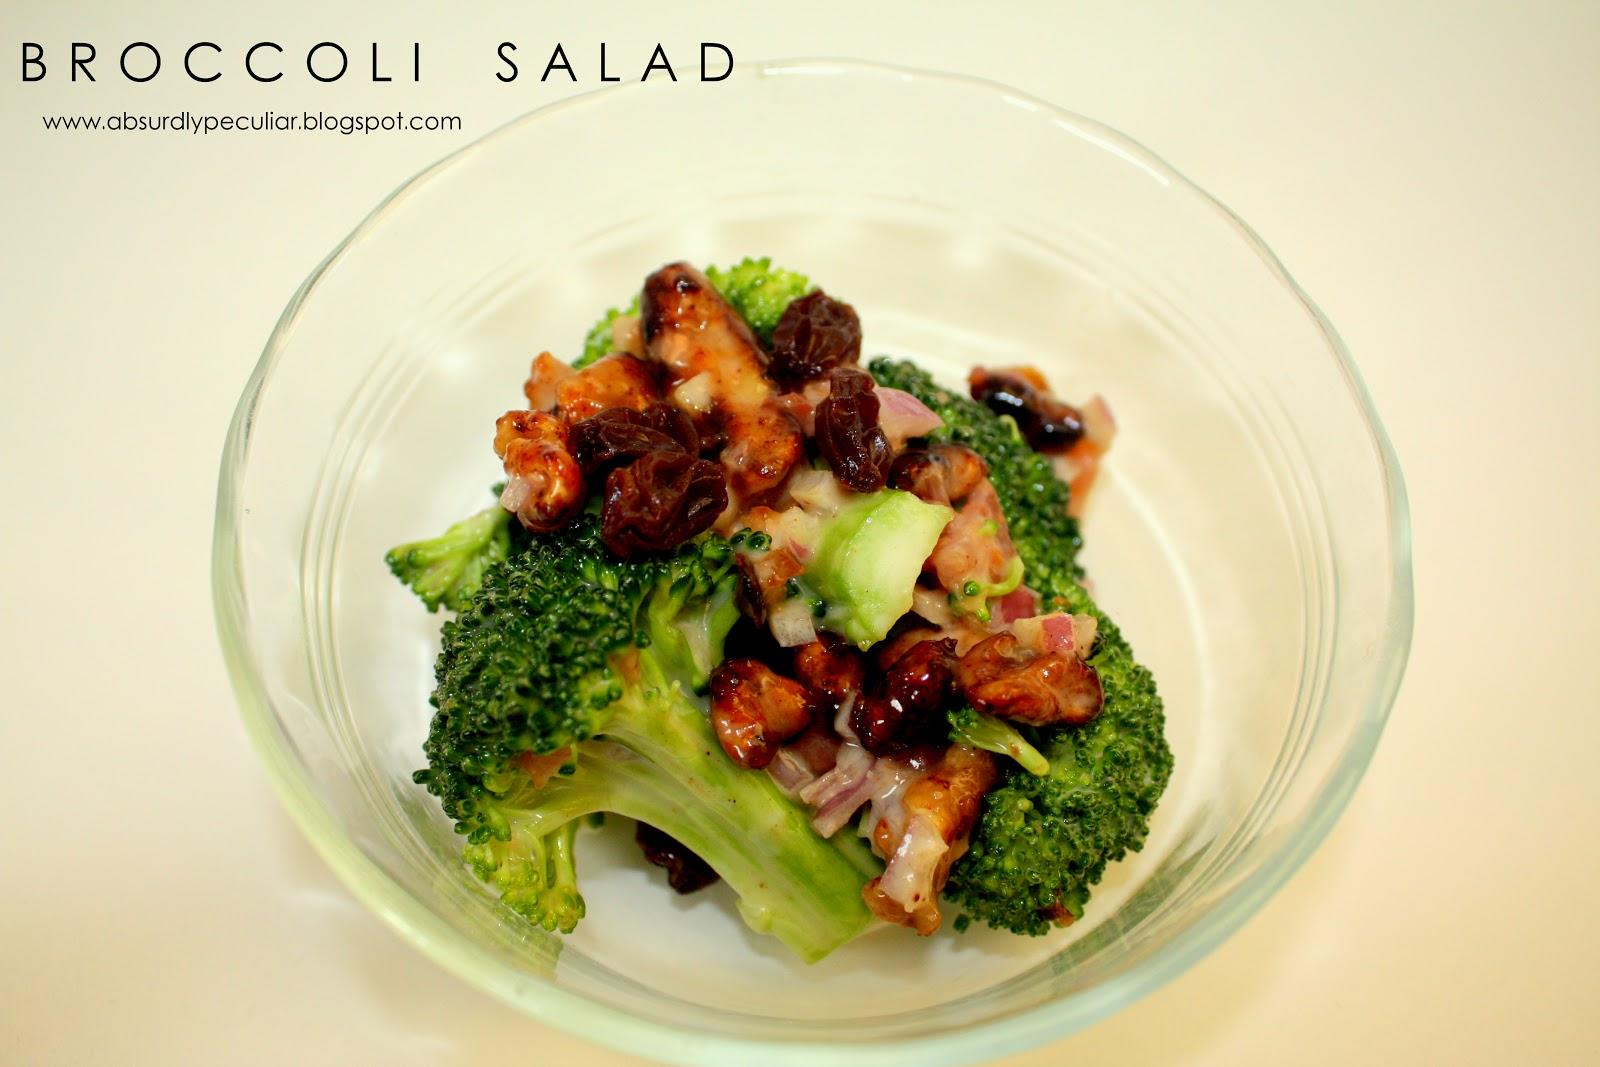 broccoli, salad, broccoli salad, raisins, candied walnuts, onions, Recipe, DIY